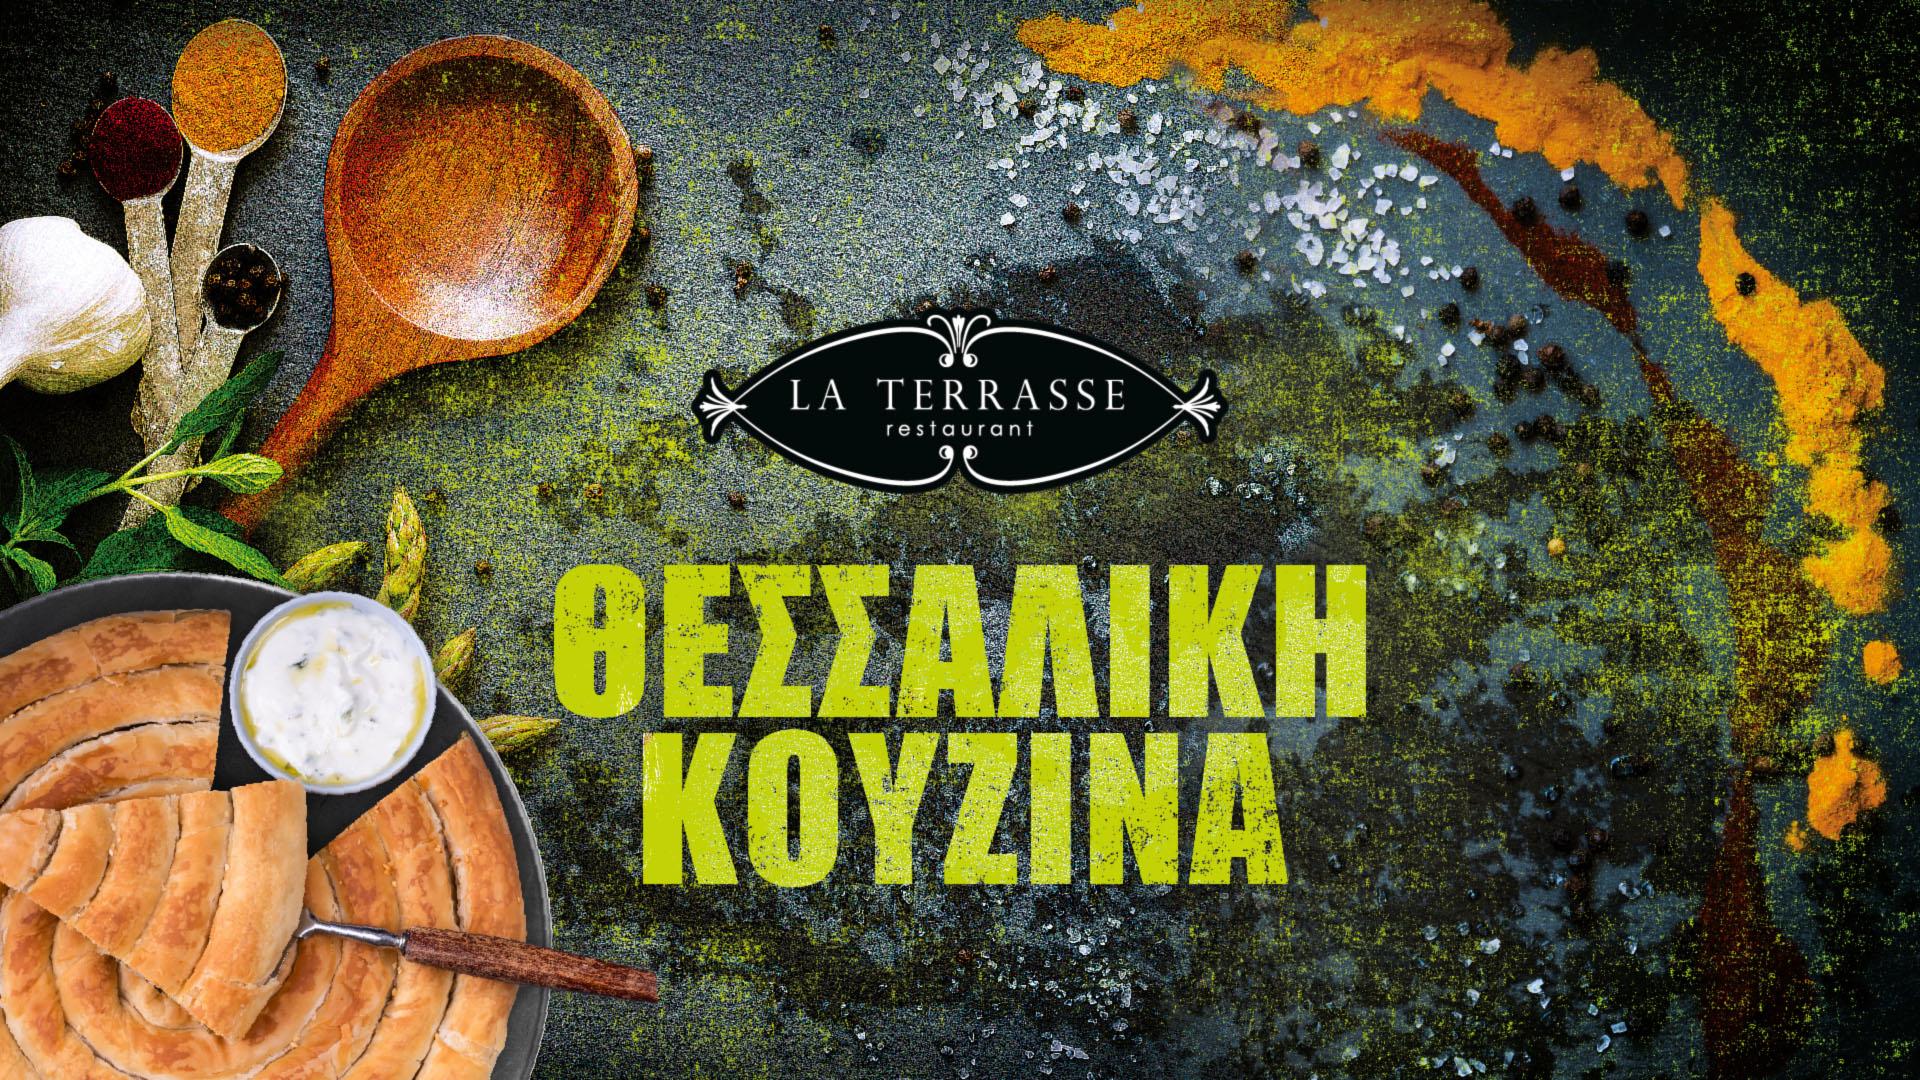 THESSALIKI_KOUZINA_slideshow_001-01